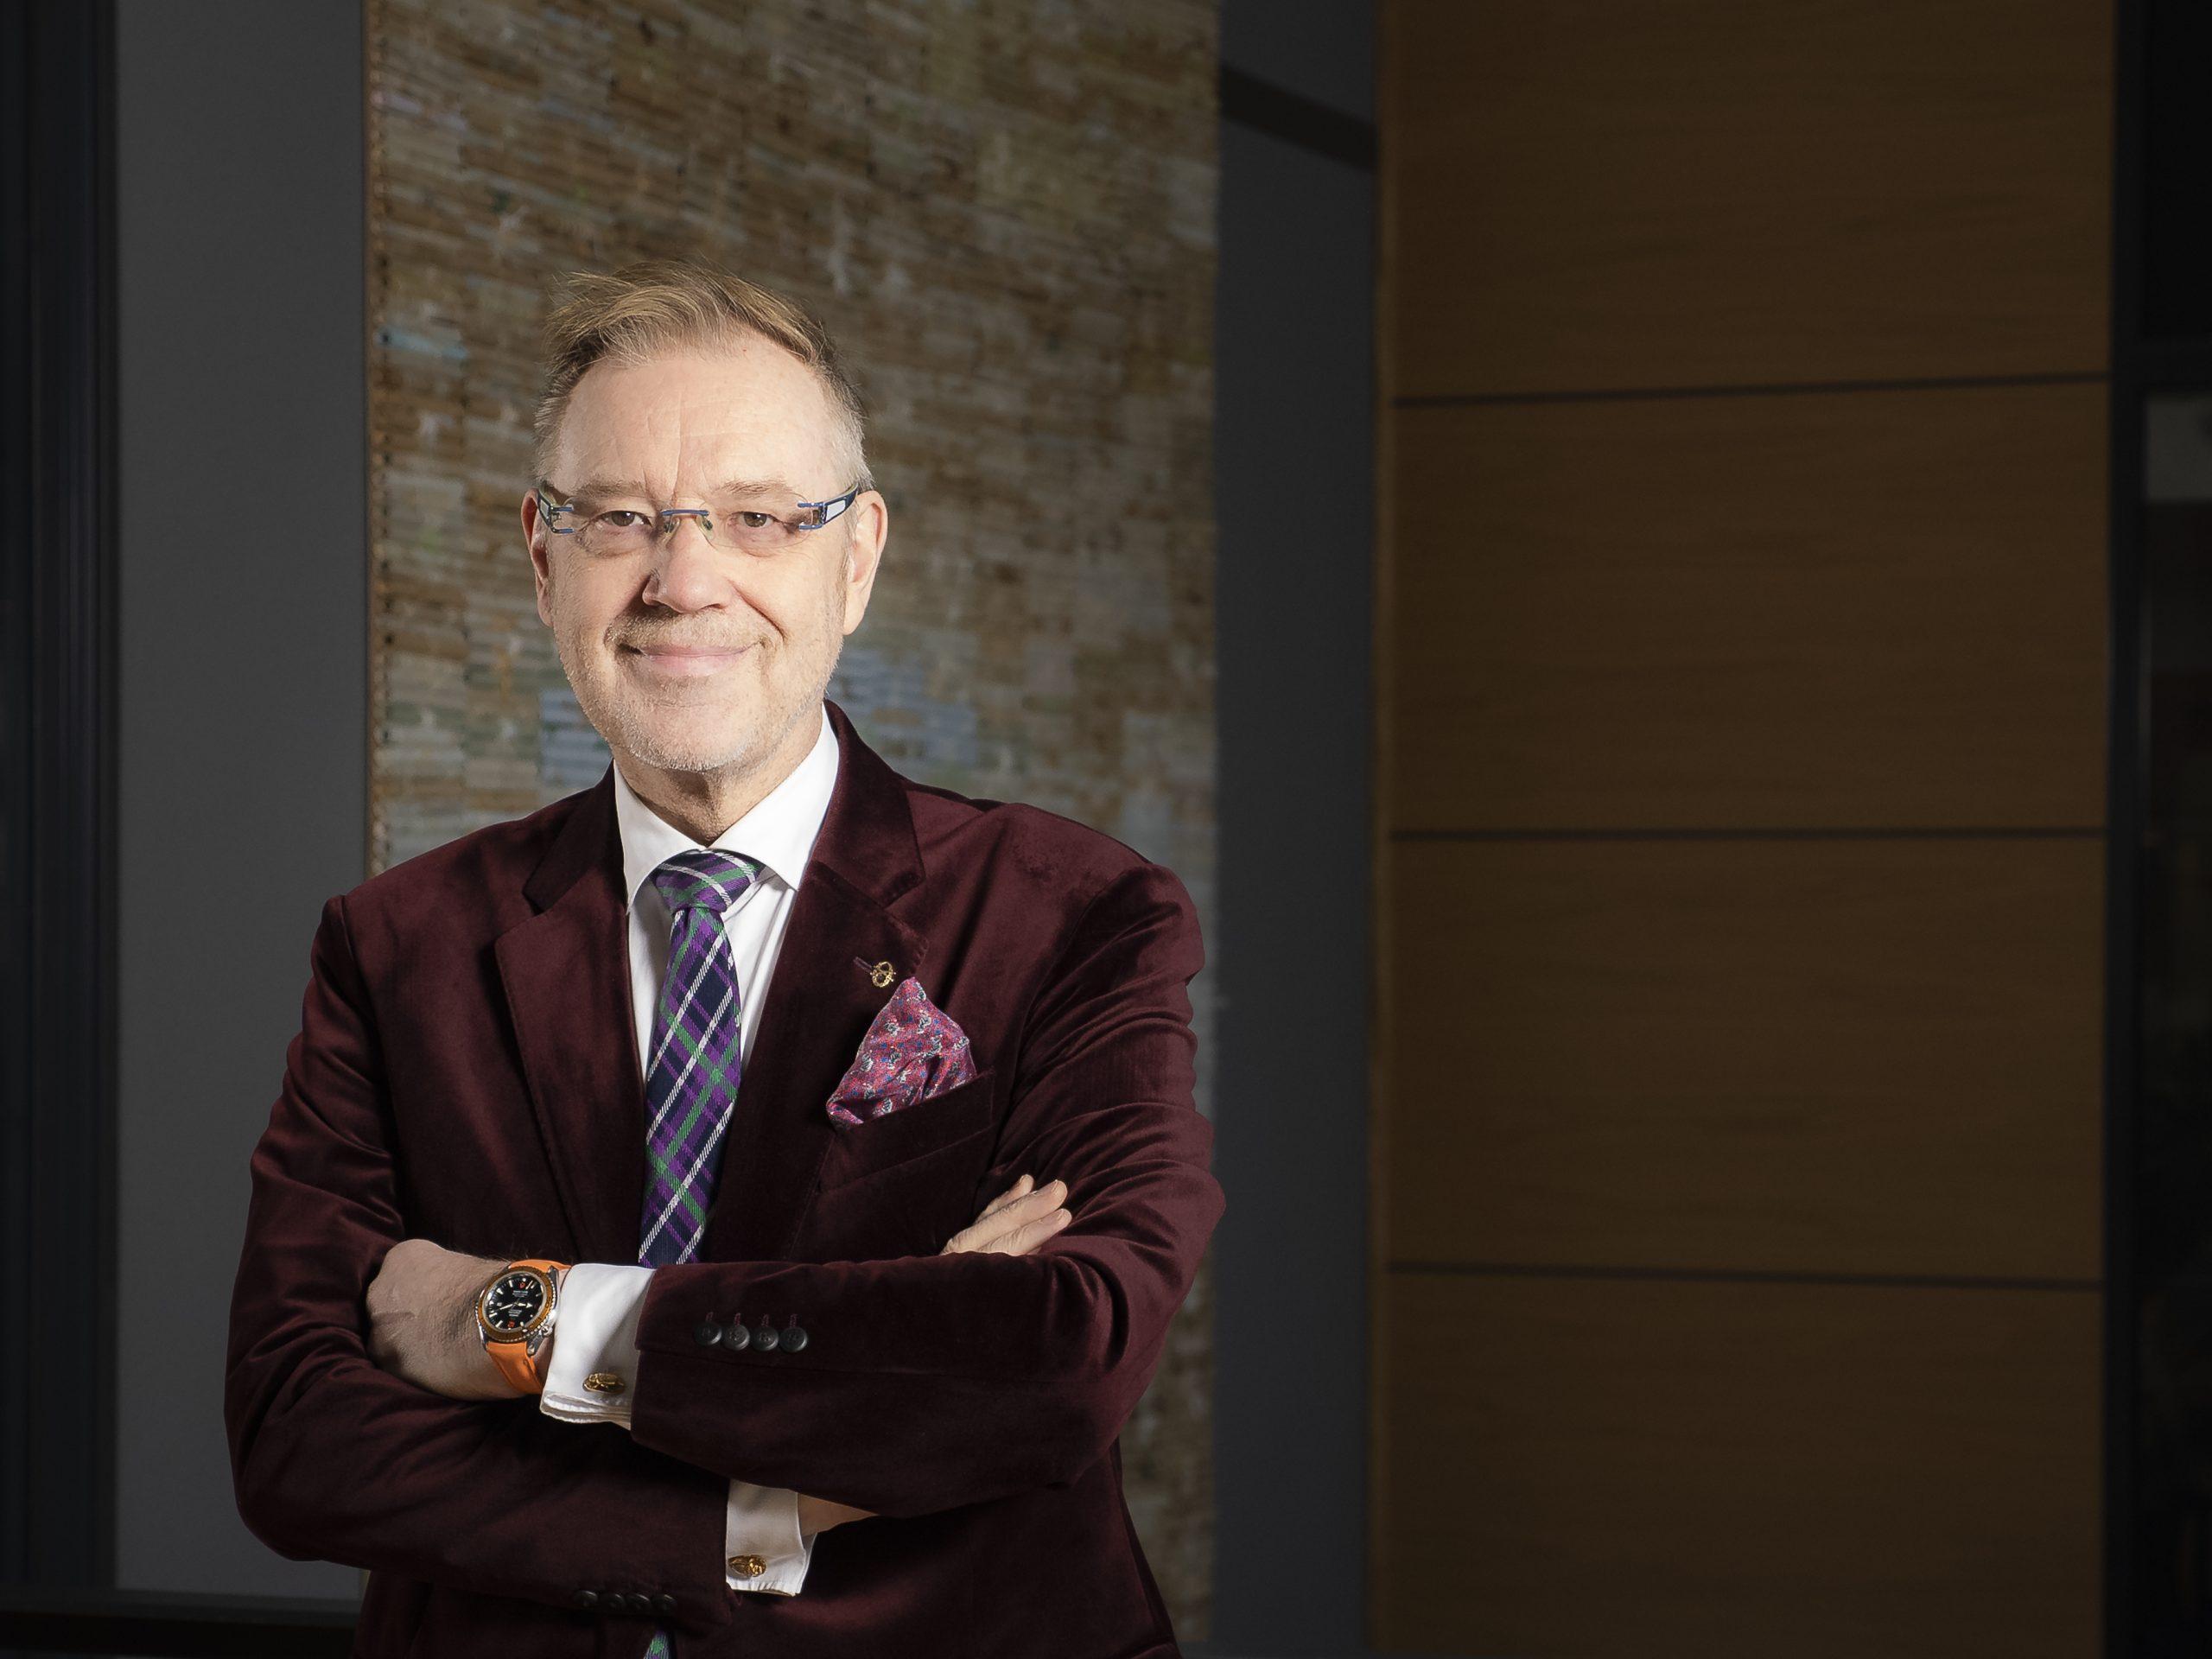 Konsernijohtaja, Vesa-Pekka Kangaskorpi